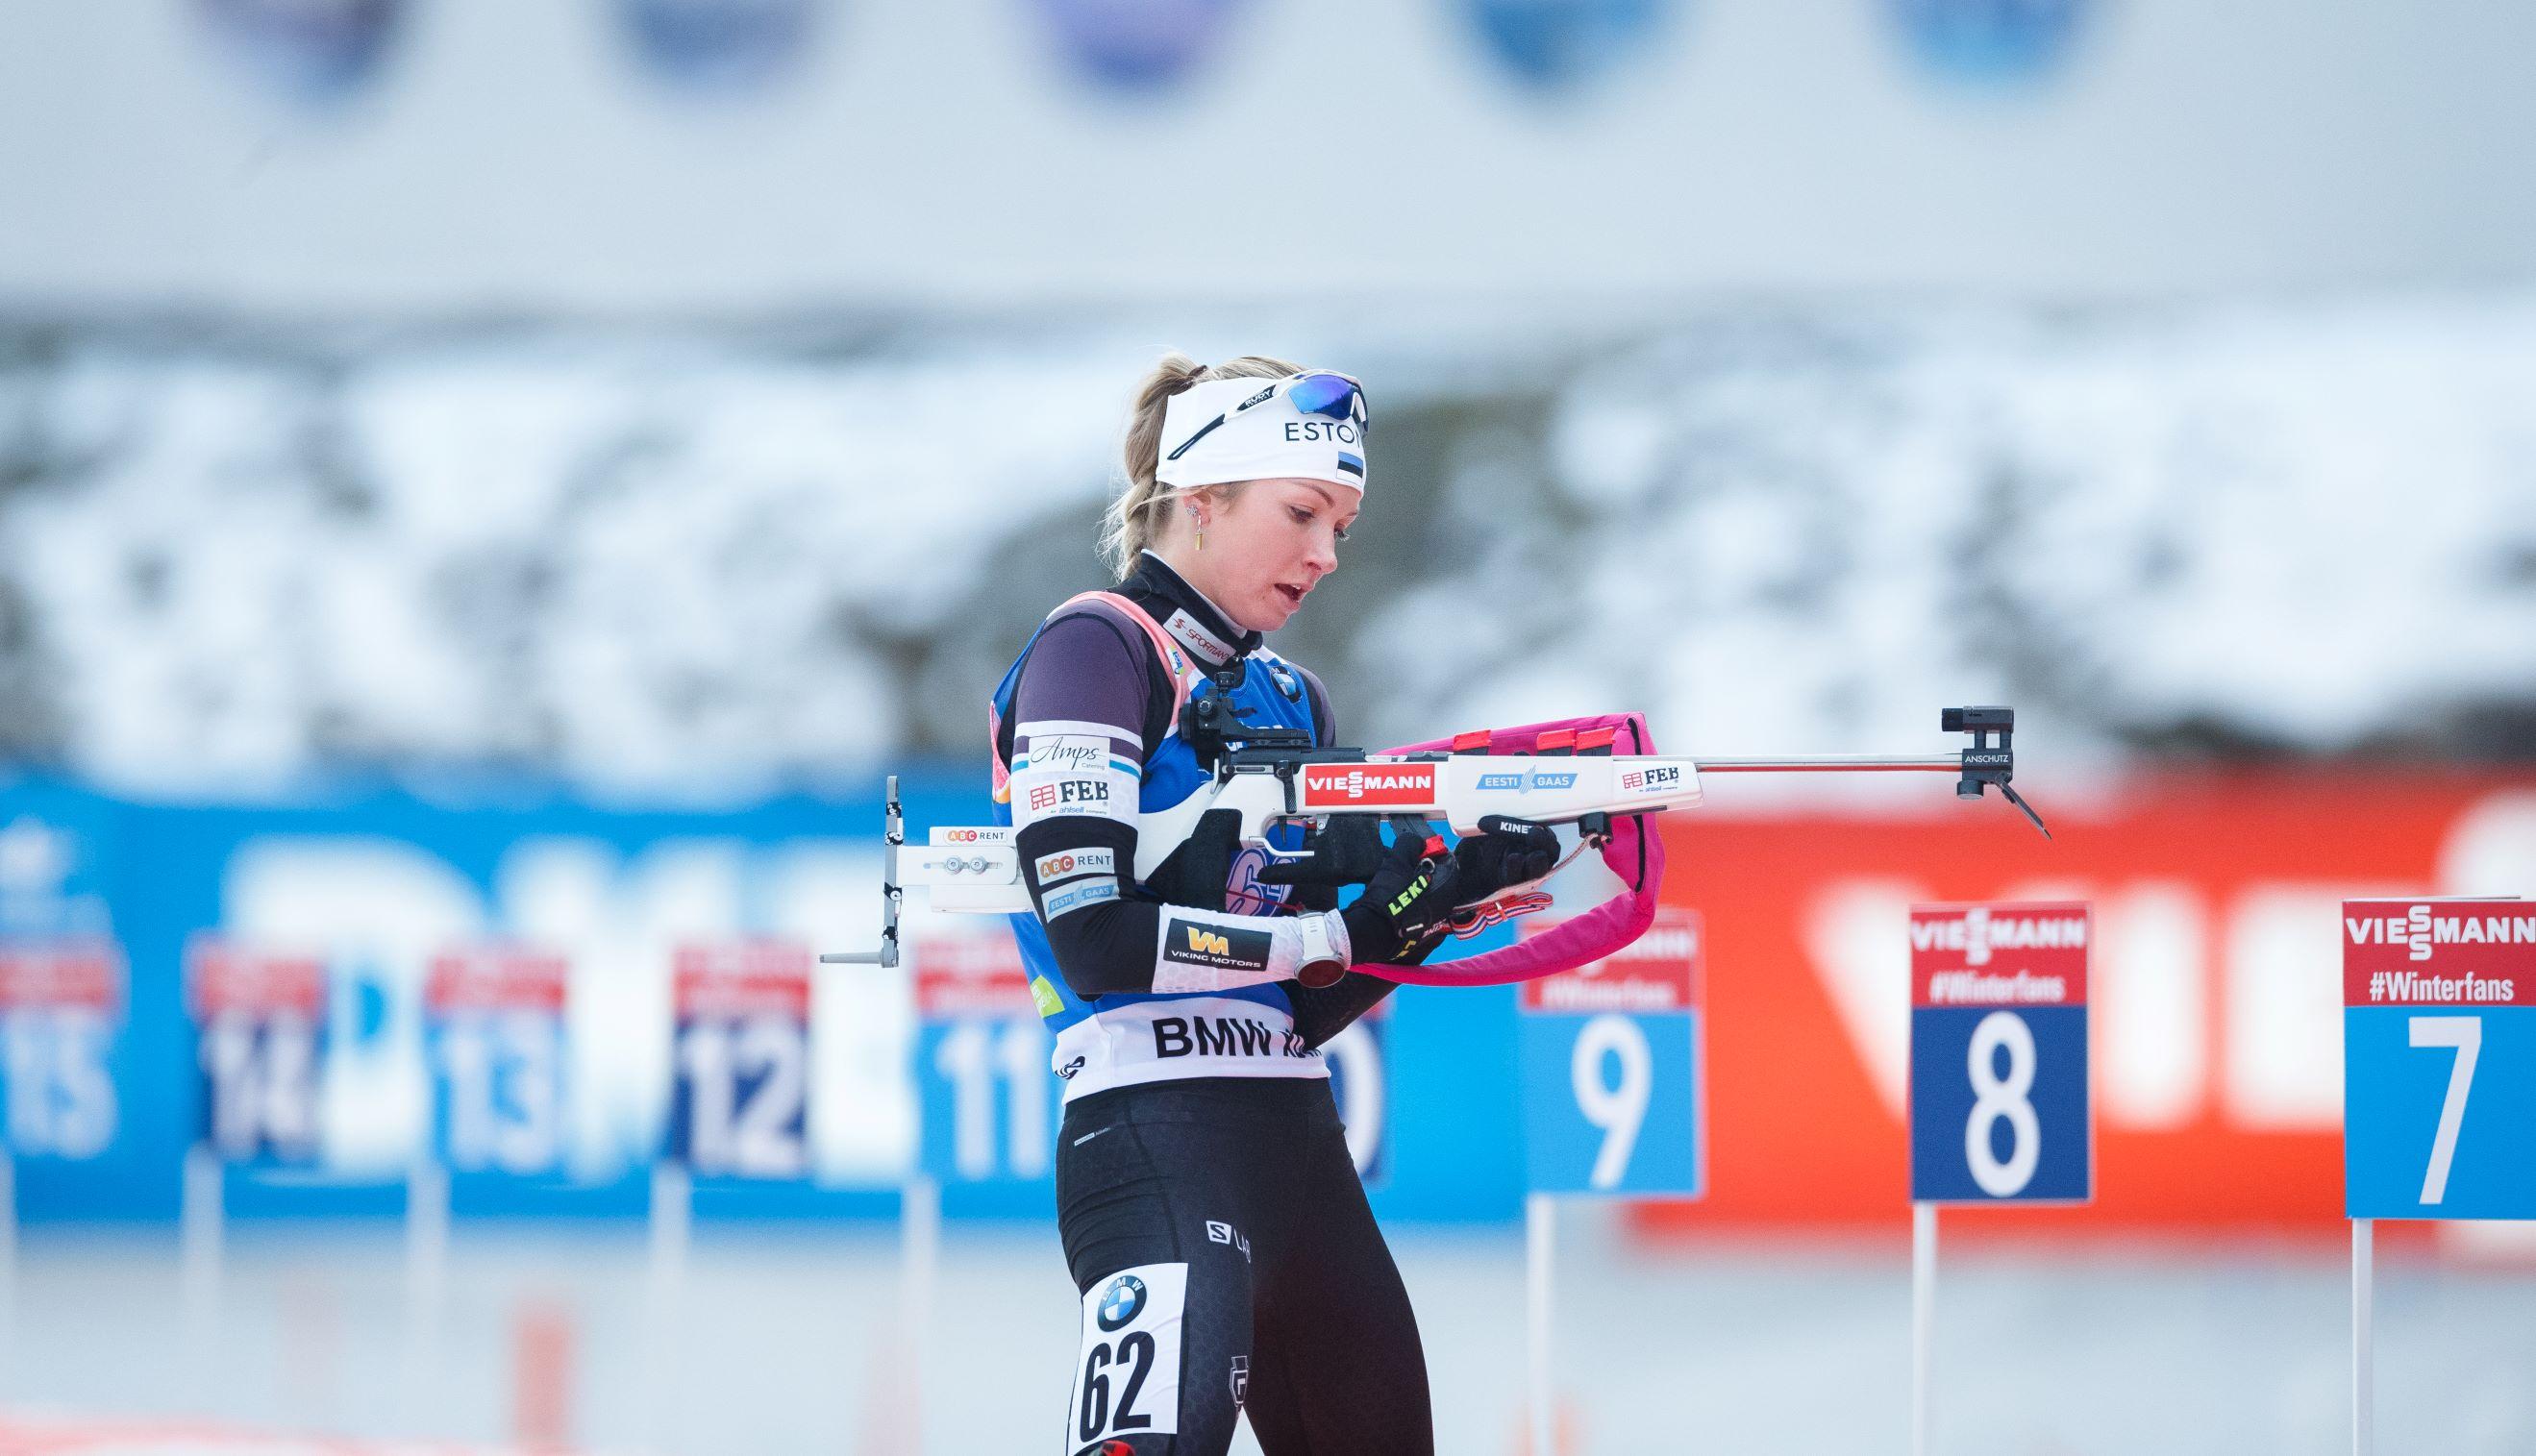 Eesti Gaas уже 10 лет является спонсором Федерации по Биатлону. Regina Oja, фото: Jarek Jõepera